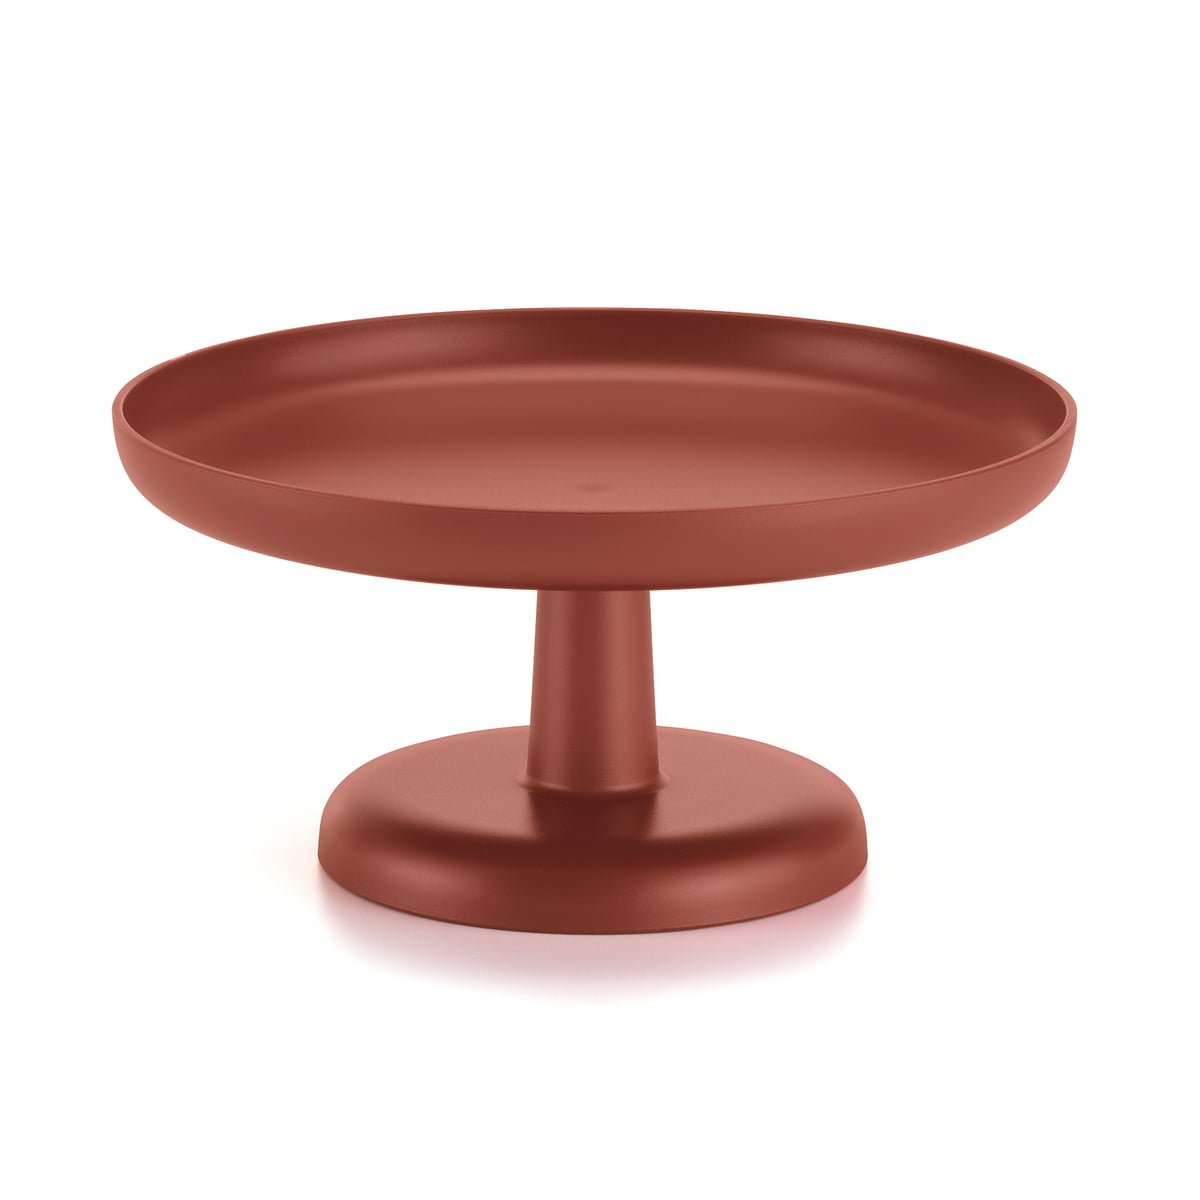 high tray tablett von vitra. Black Bedroom Furniture Sets. Home Design Ideas